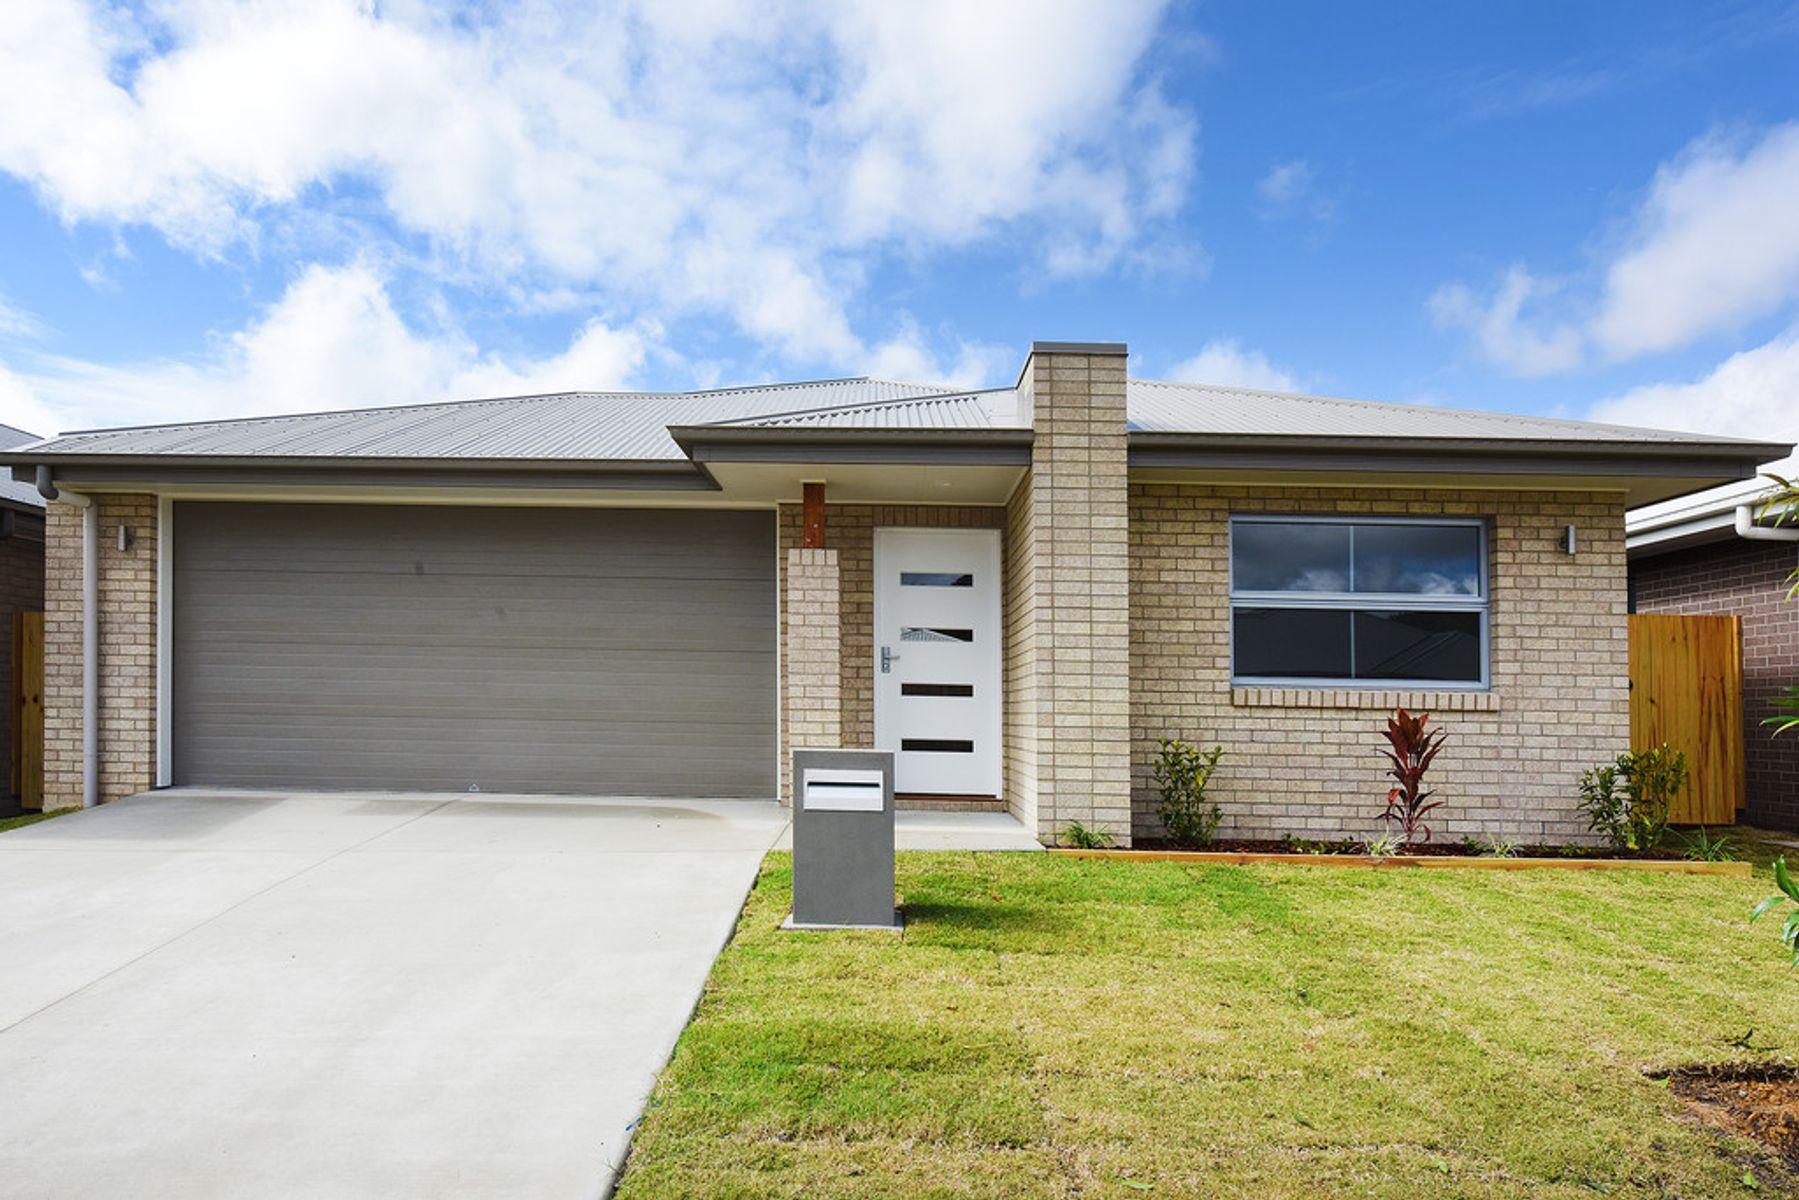 Lot 27 20 Crumpton Place, Beerwah, QLD 4519